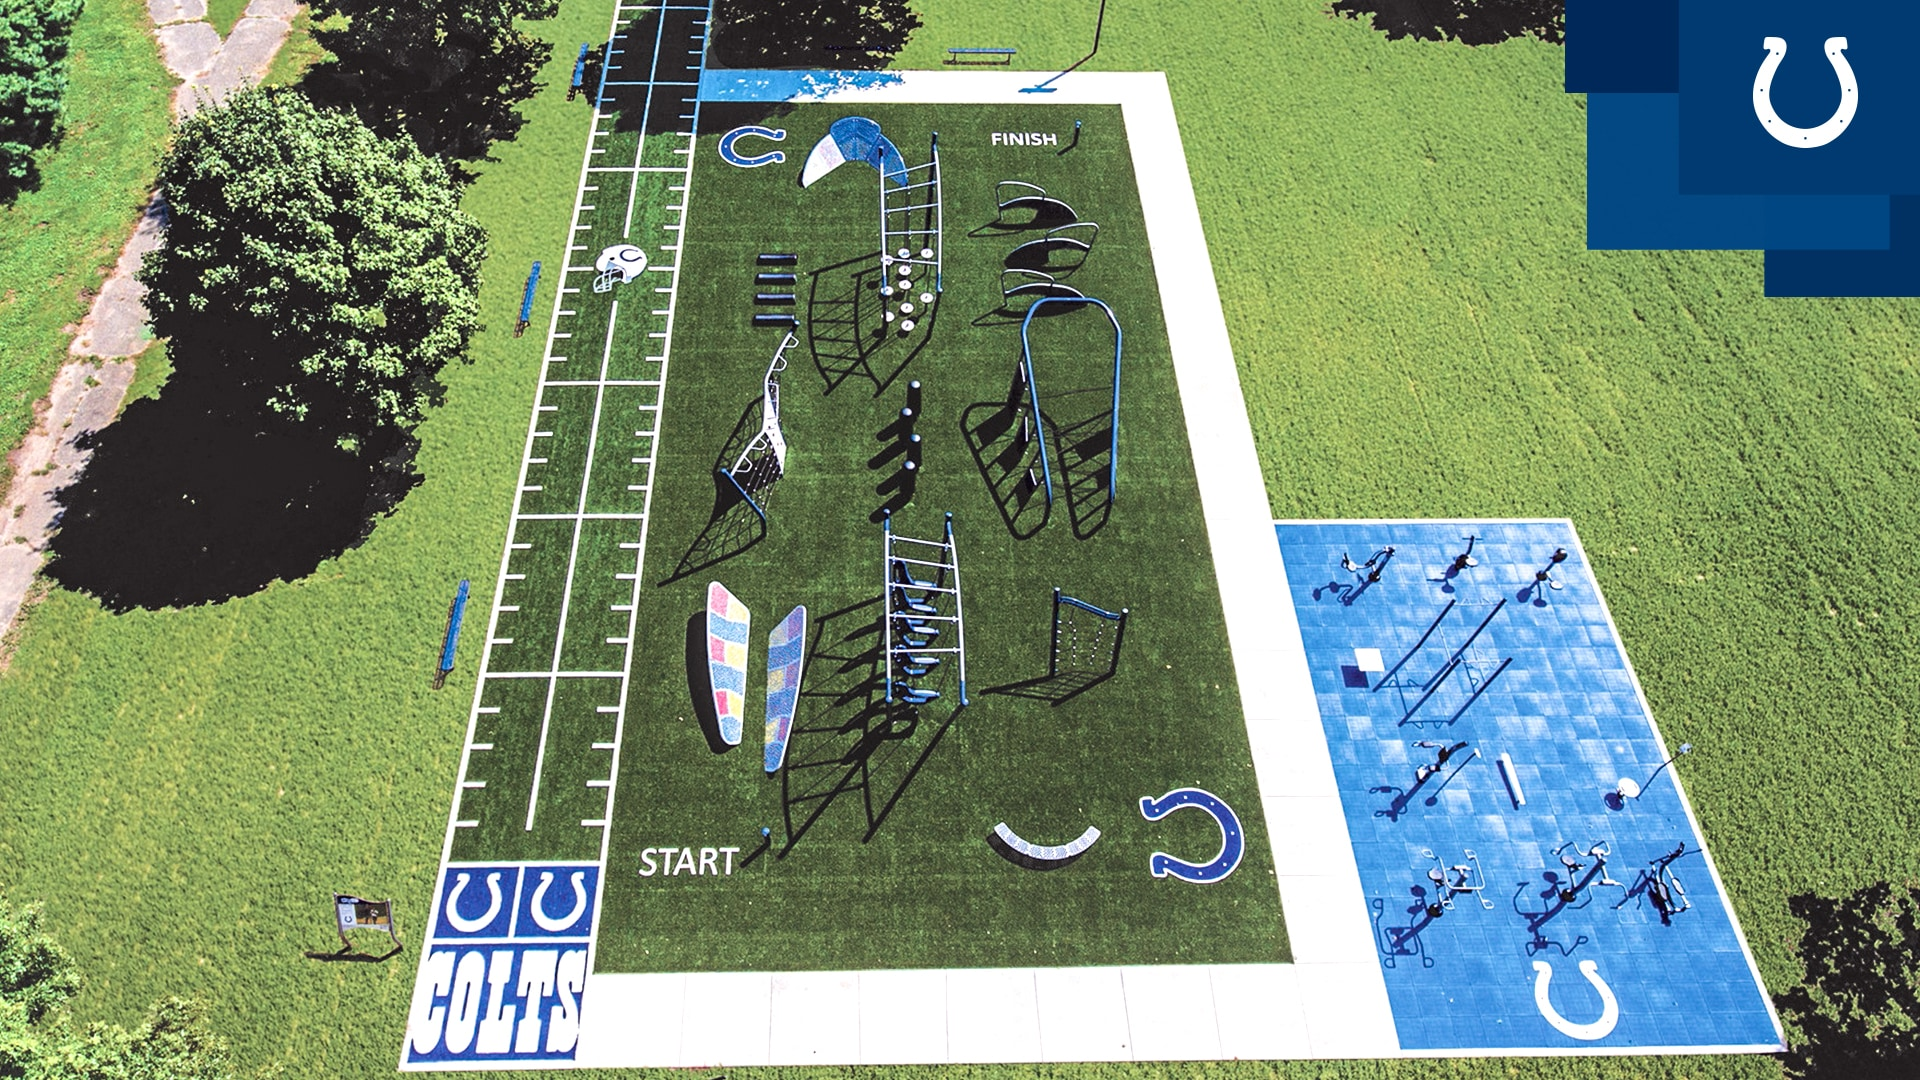 Colts Fitness Park